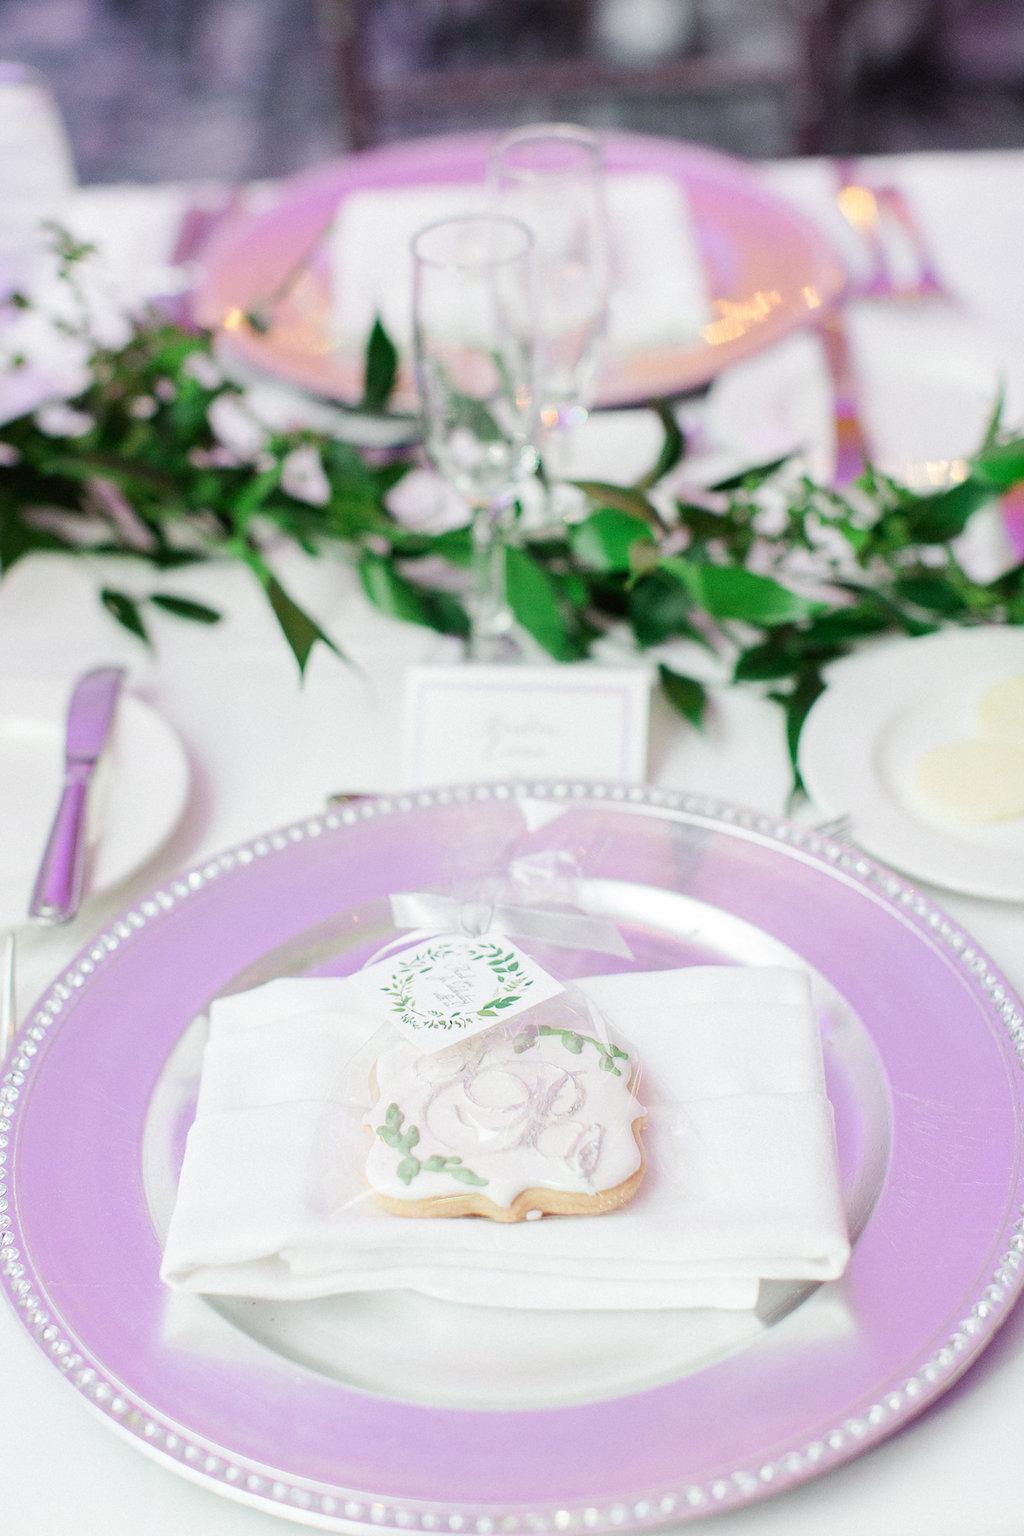 Ballroom Reception Decor, Silver Charger, Custom Monogram Wedding Cookie Favor, Greenery Garland   Tampa Wedding Photographer Ailyn La Torre